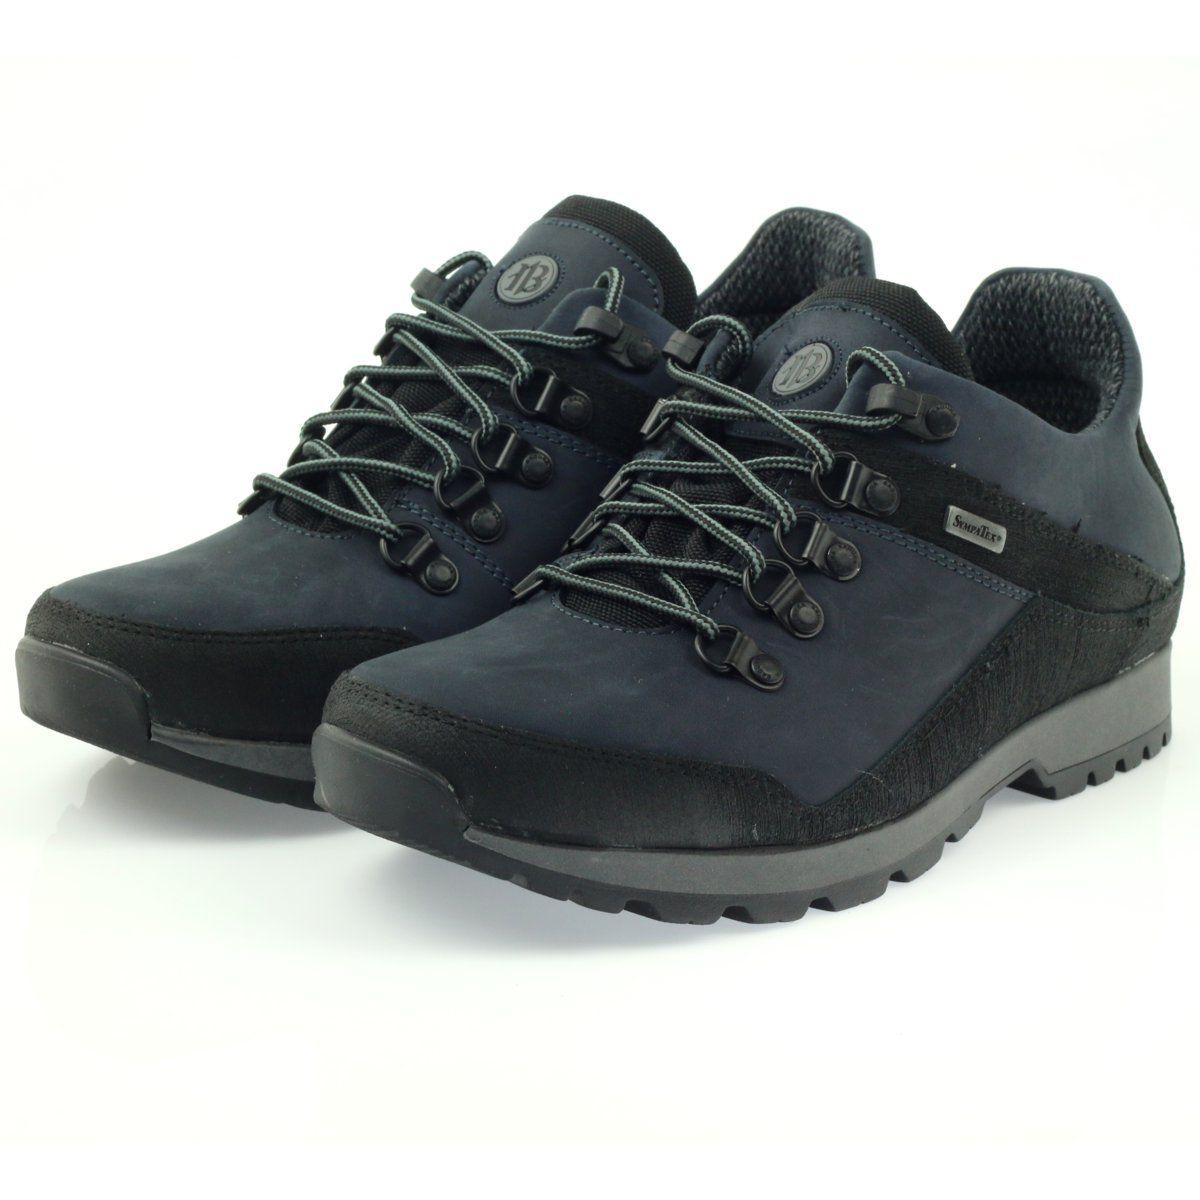 Trekkingi Z Membrana Sympatex Badura 3141 Granatowe Boots Shoes Women Heels Timberland Boots